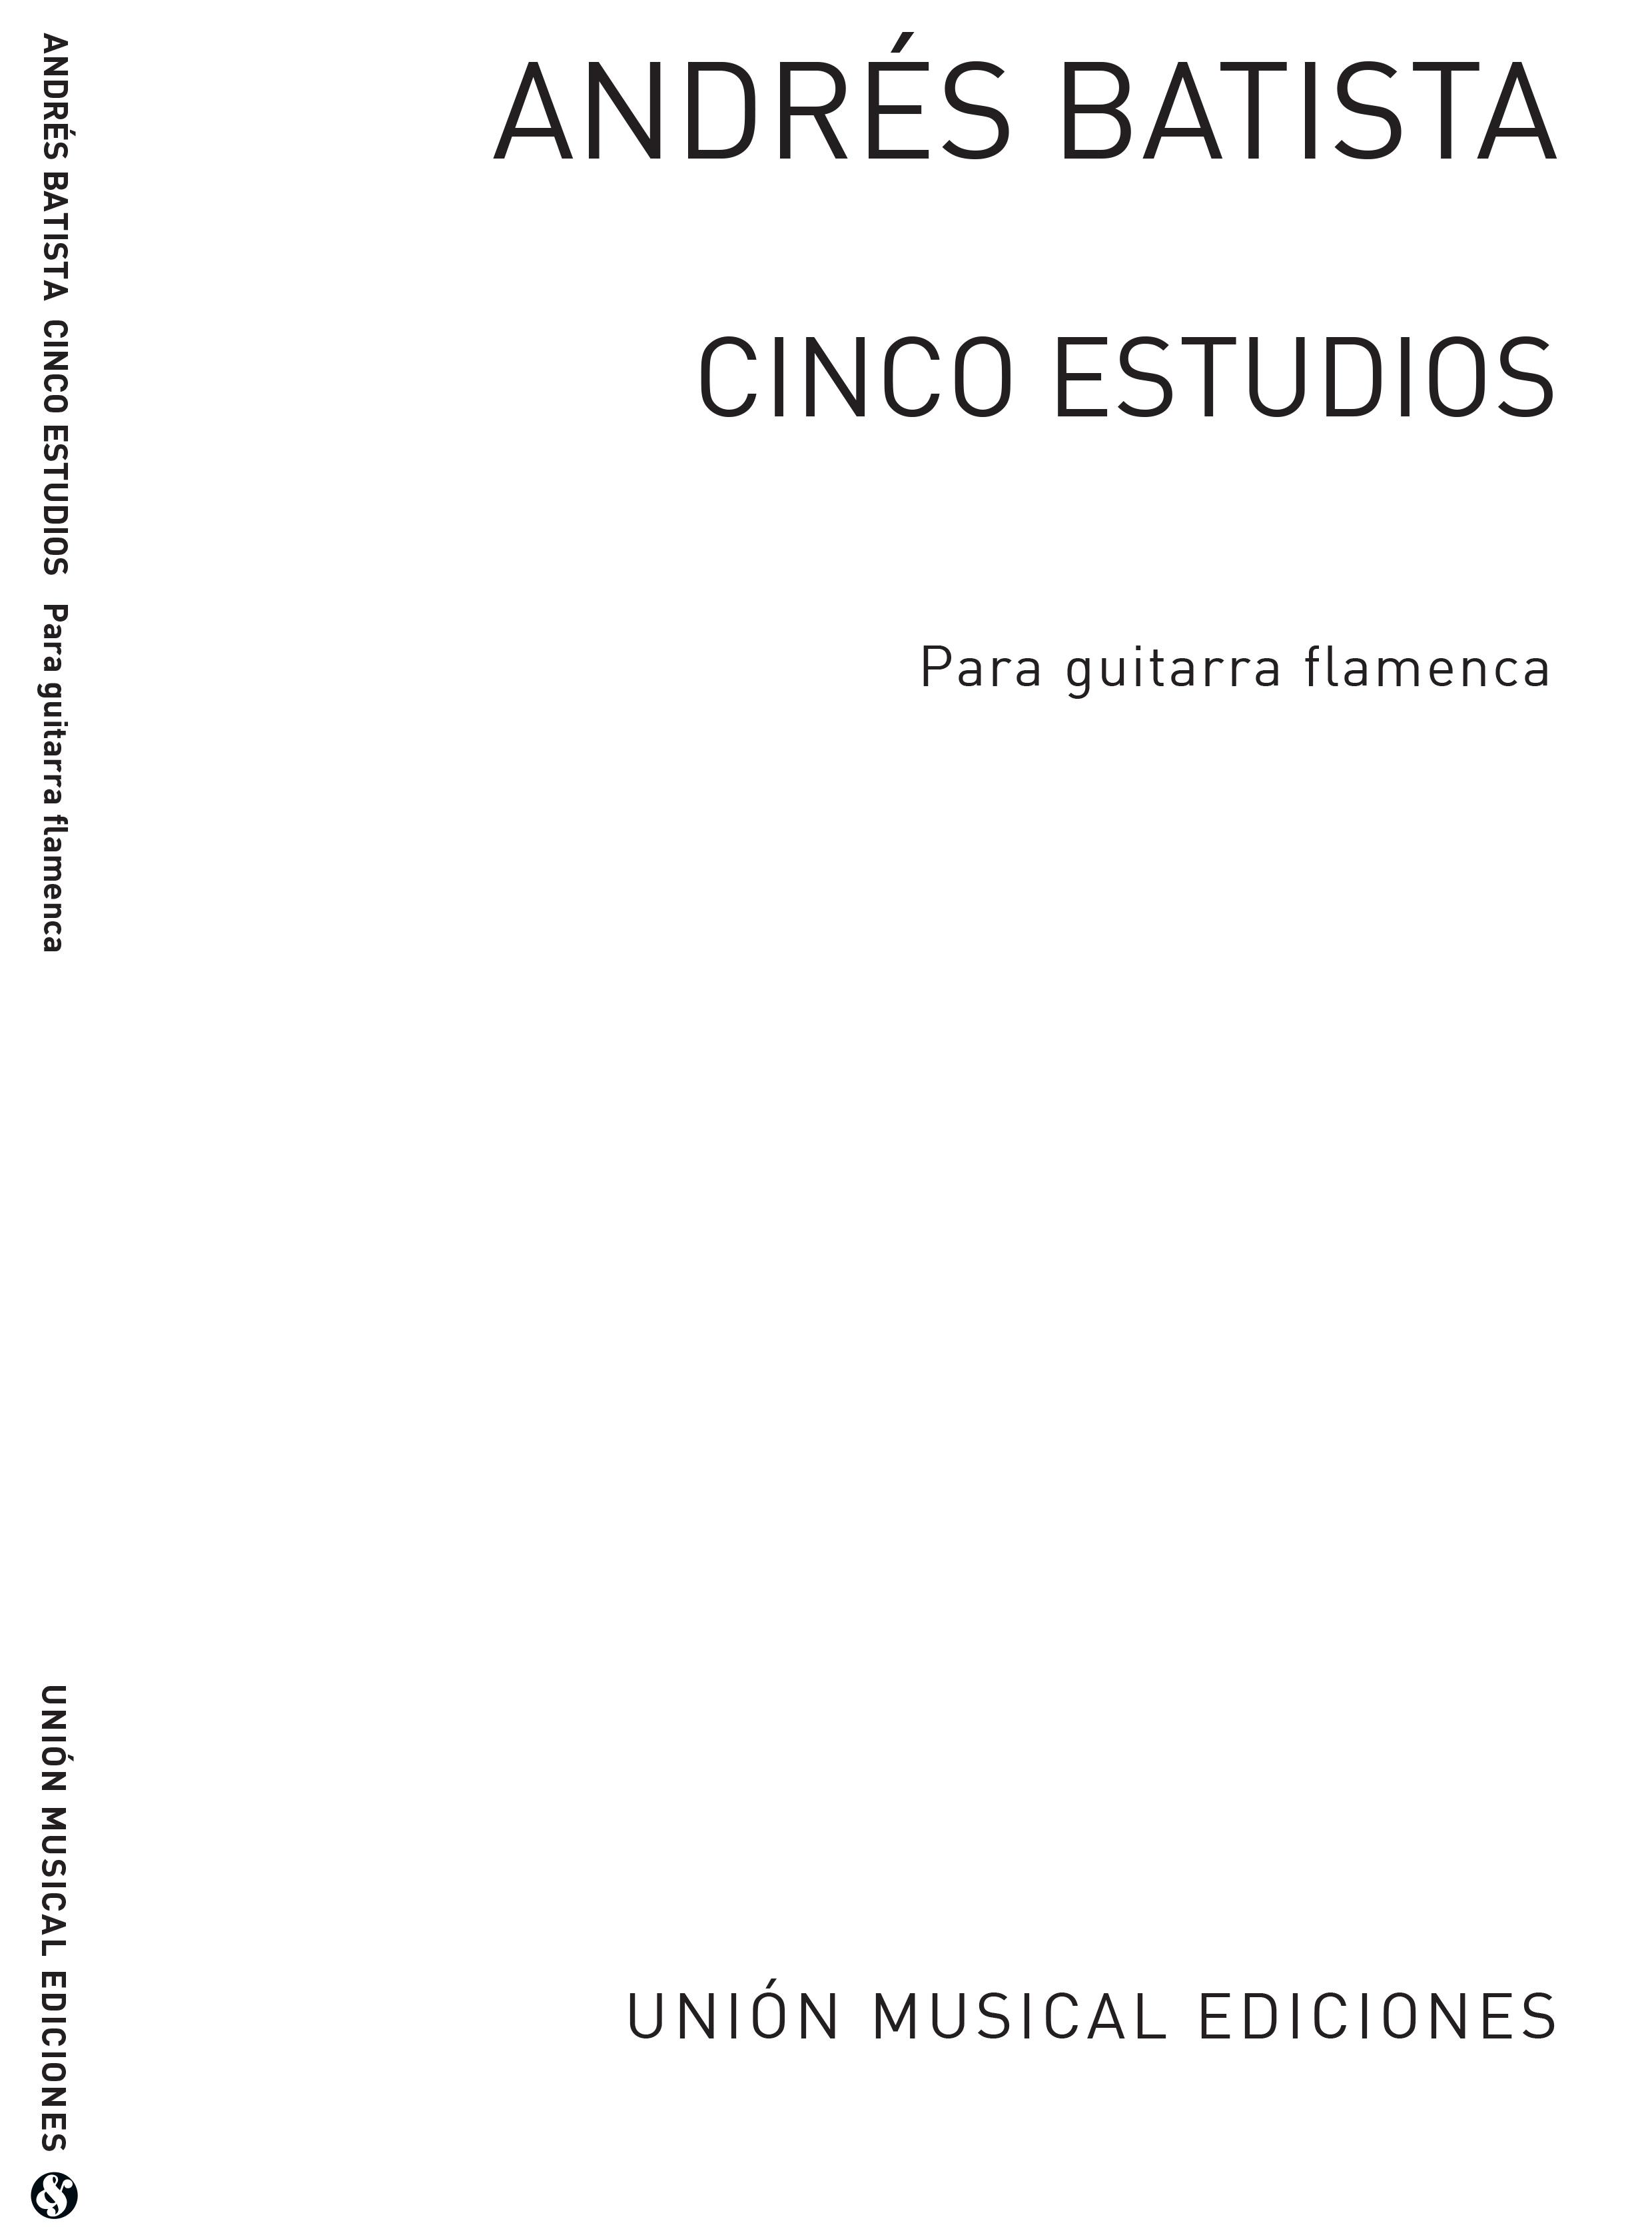 Andres Batista: Cinco Estudios Para Guitarra Flamenca: Guitar: Instrumental Work